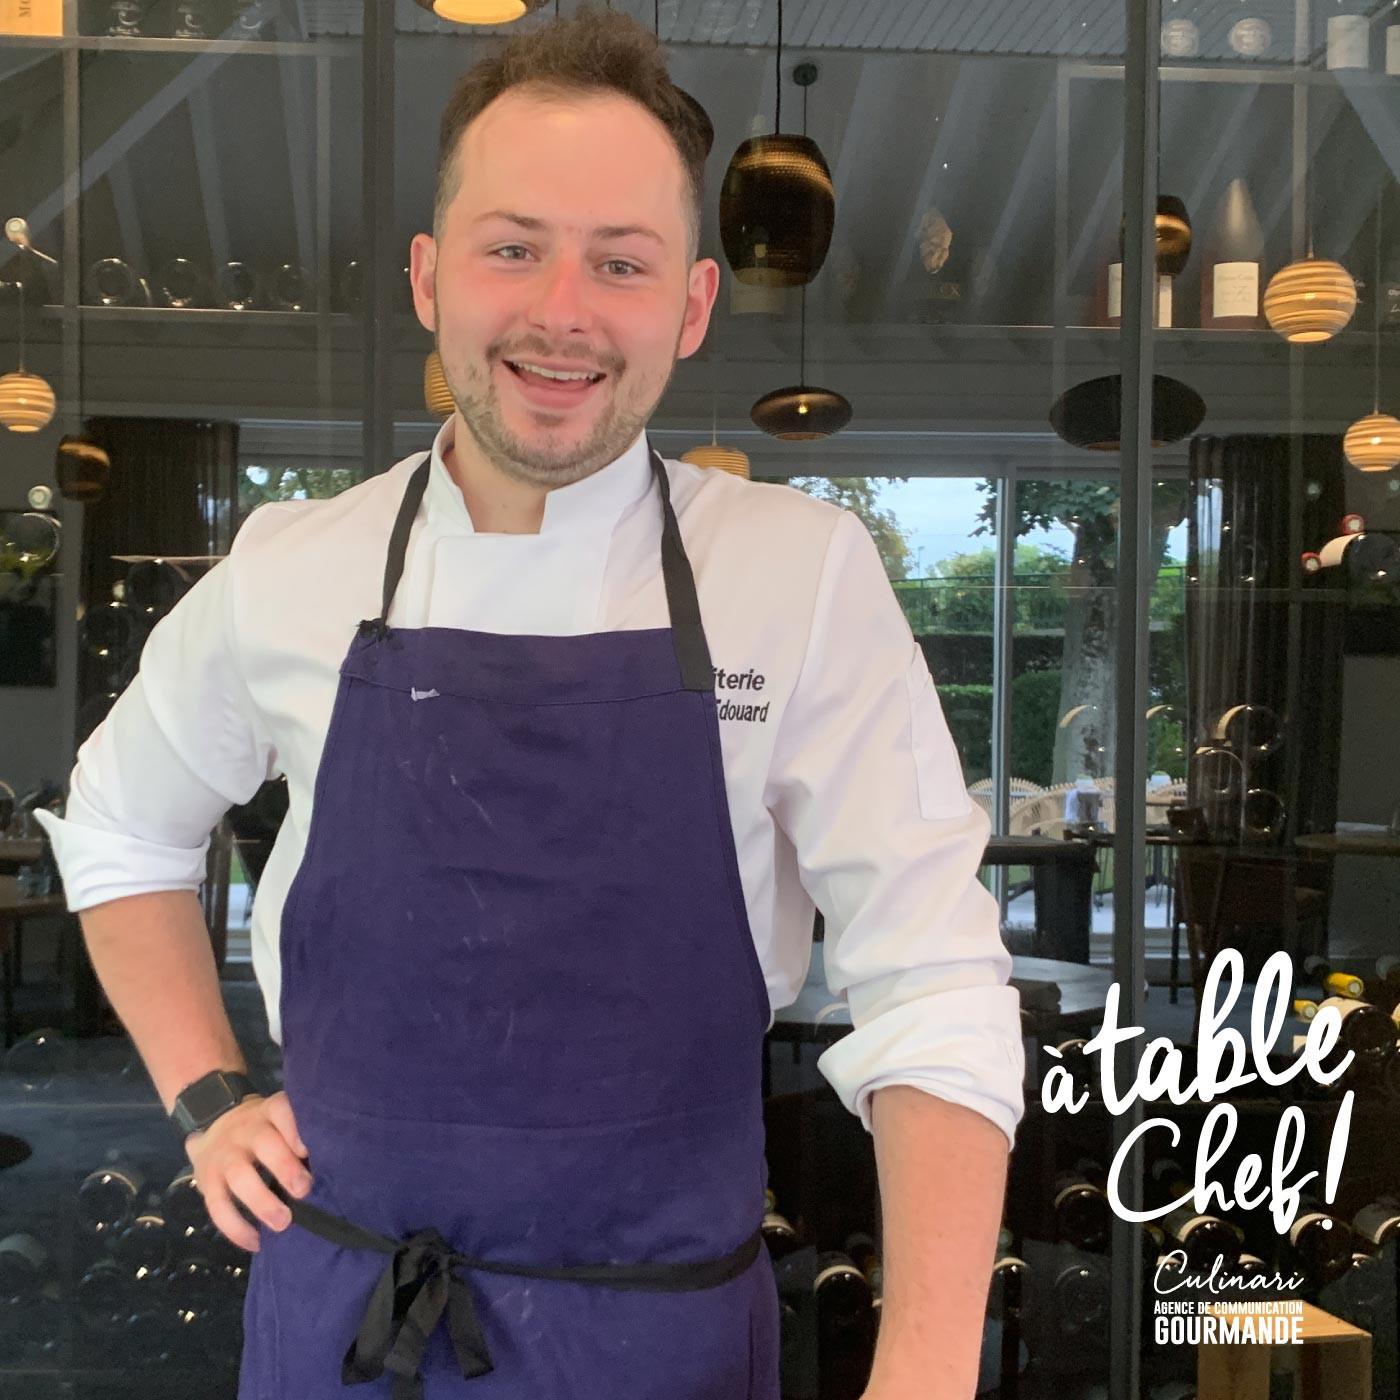 Chef Edouard Chouteau